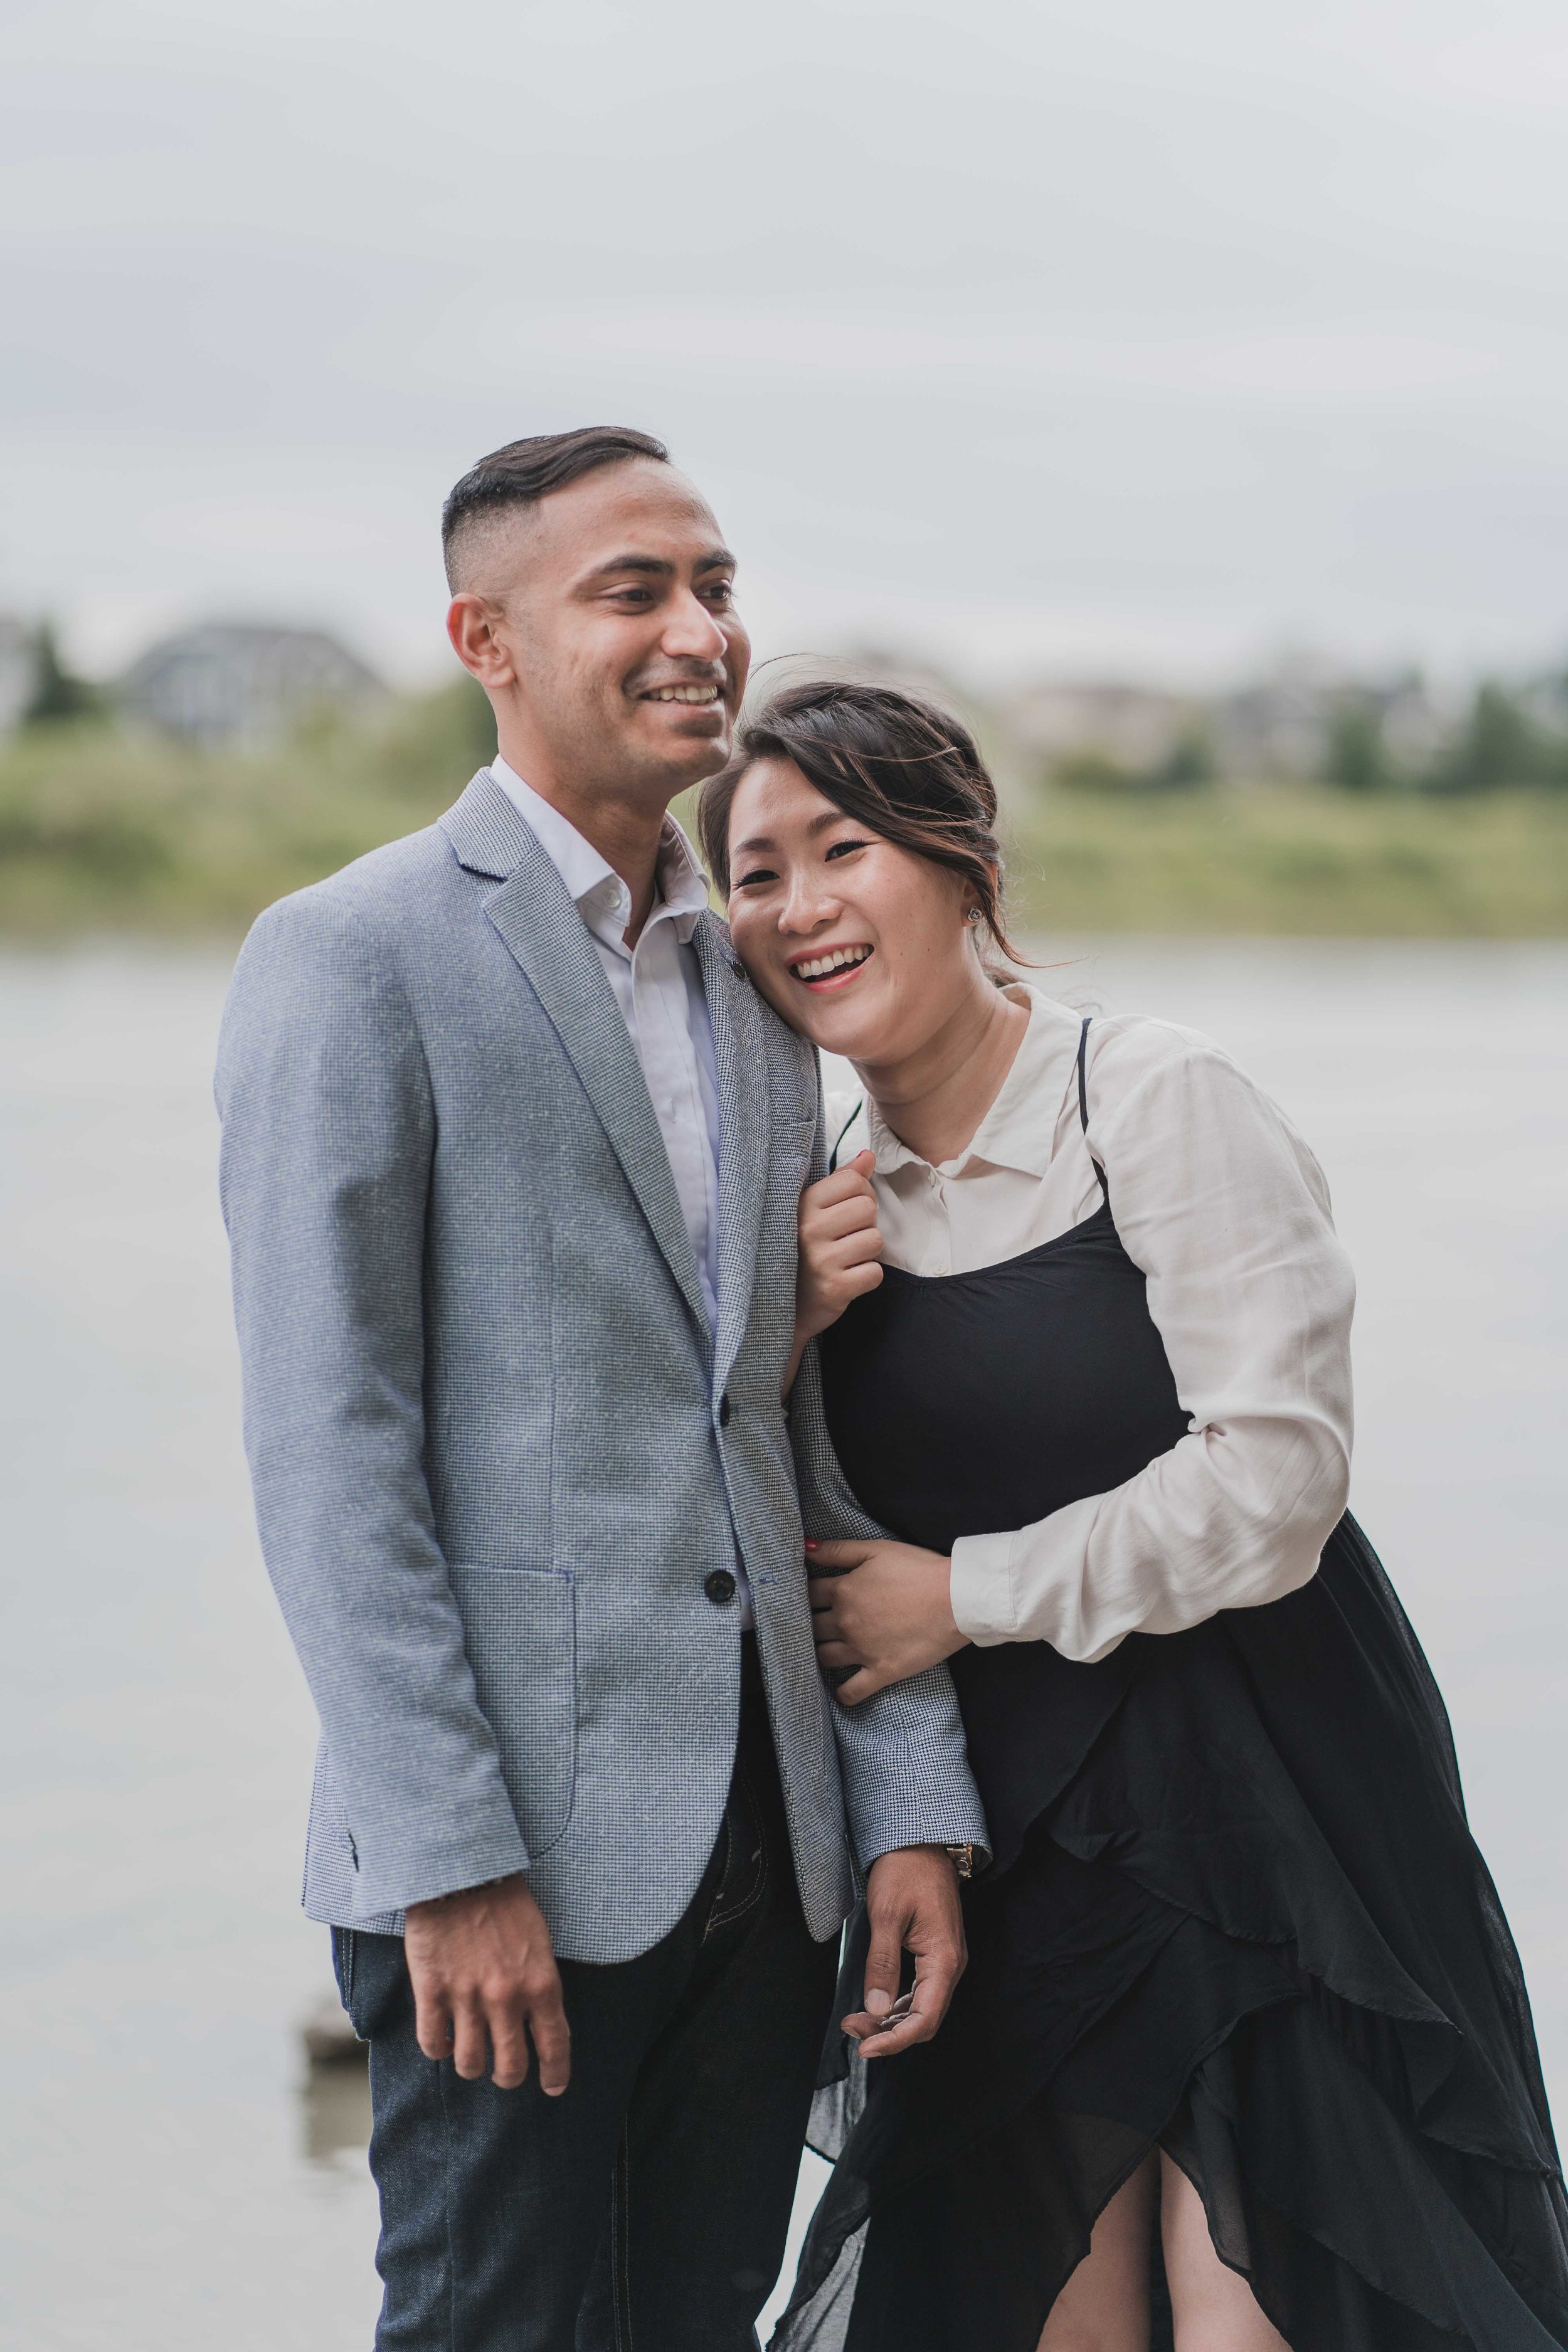 20190622 - Monika & Johnson Engagement - 0128.jpg